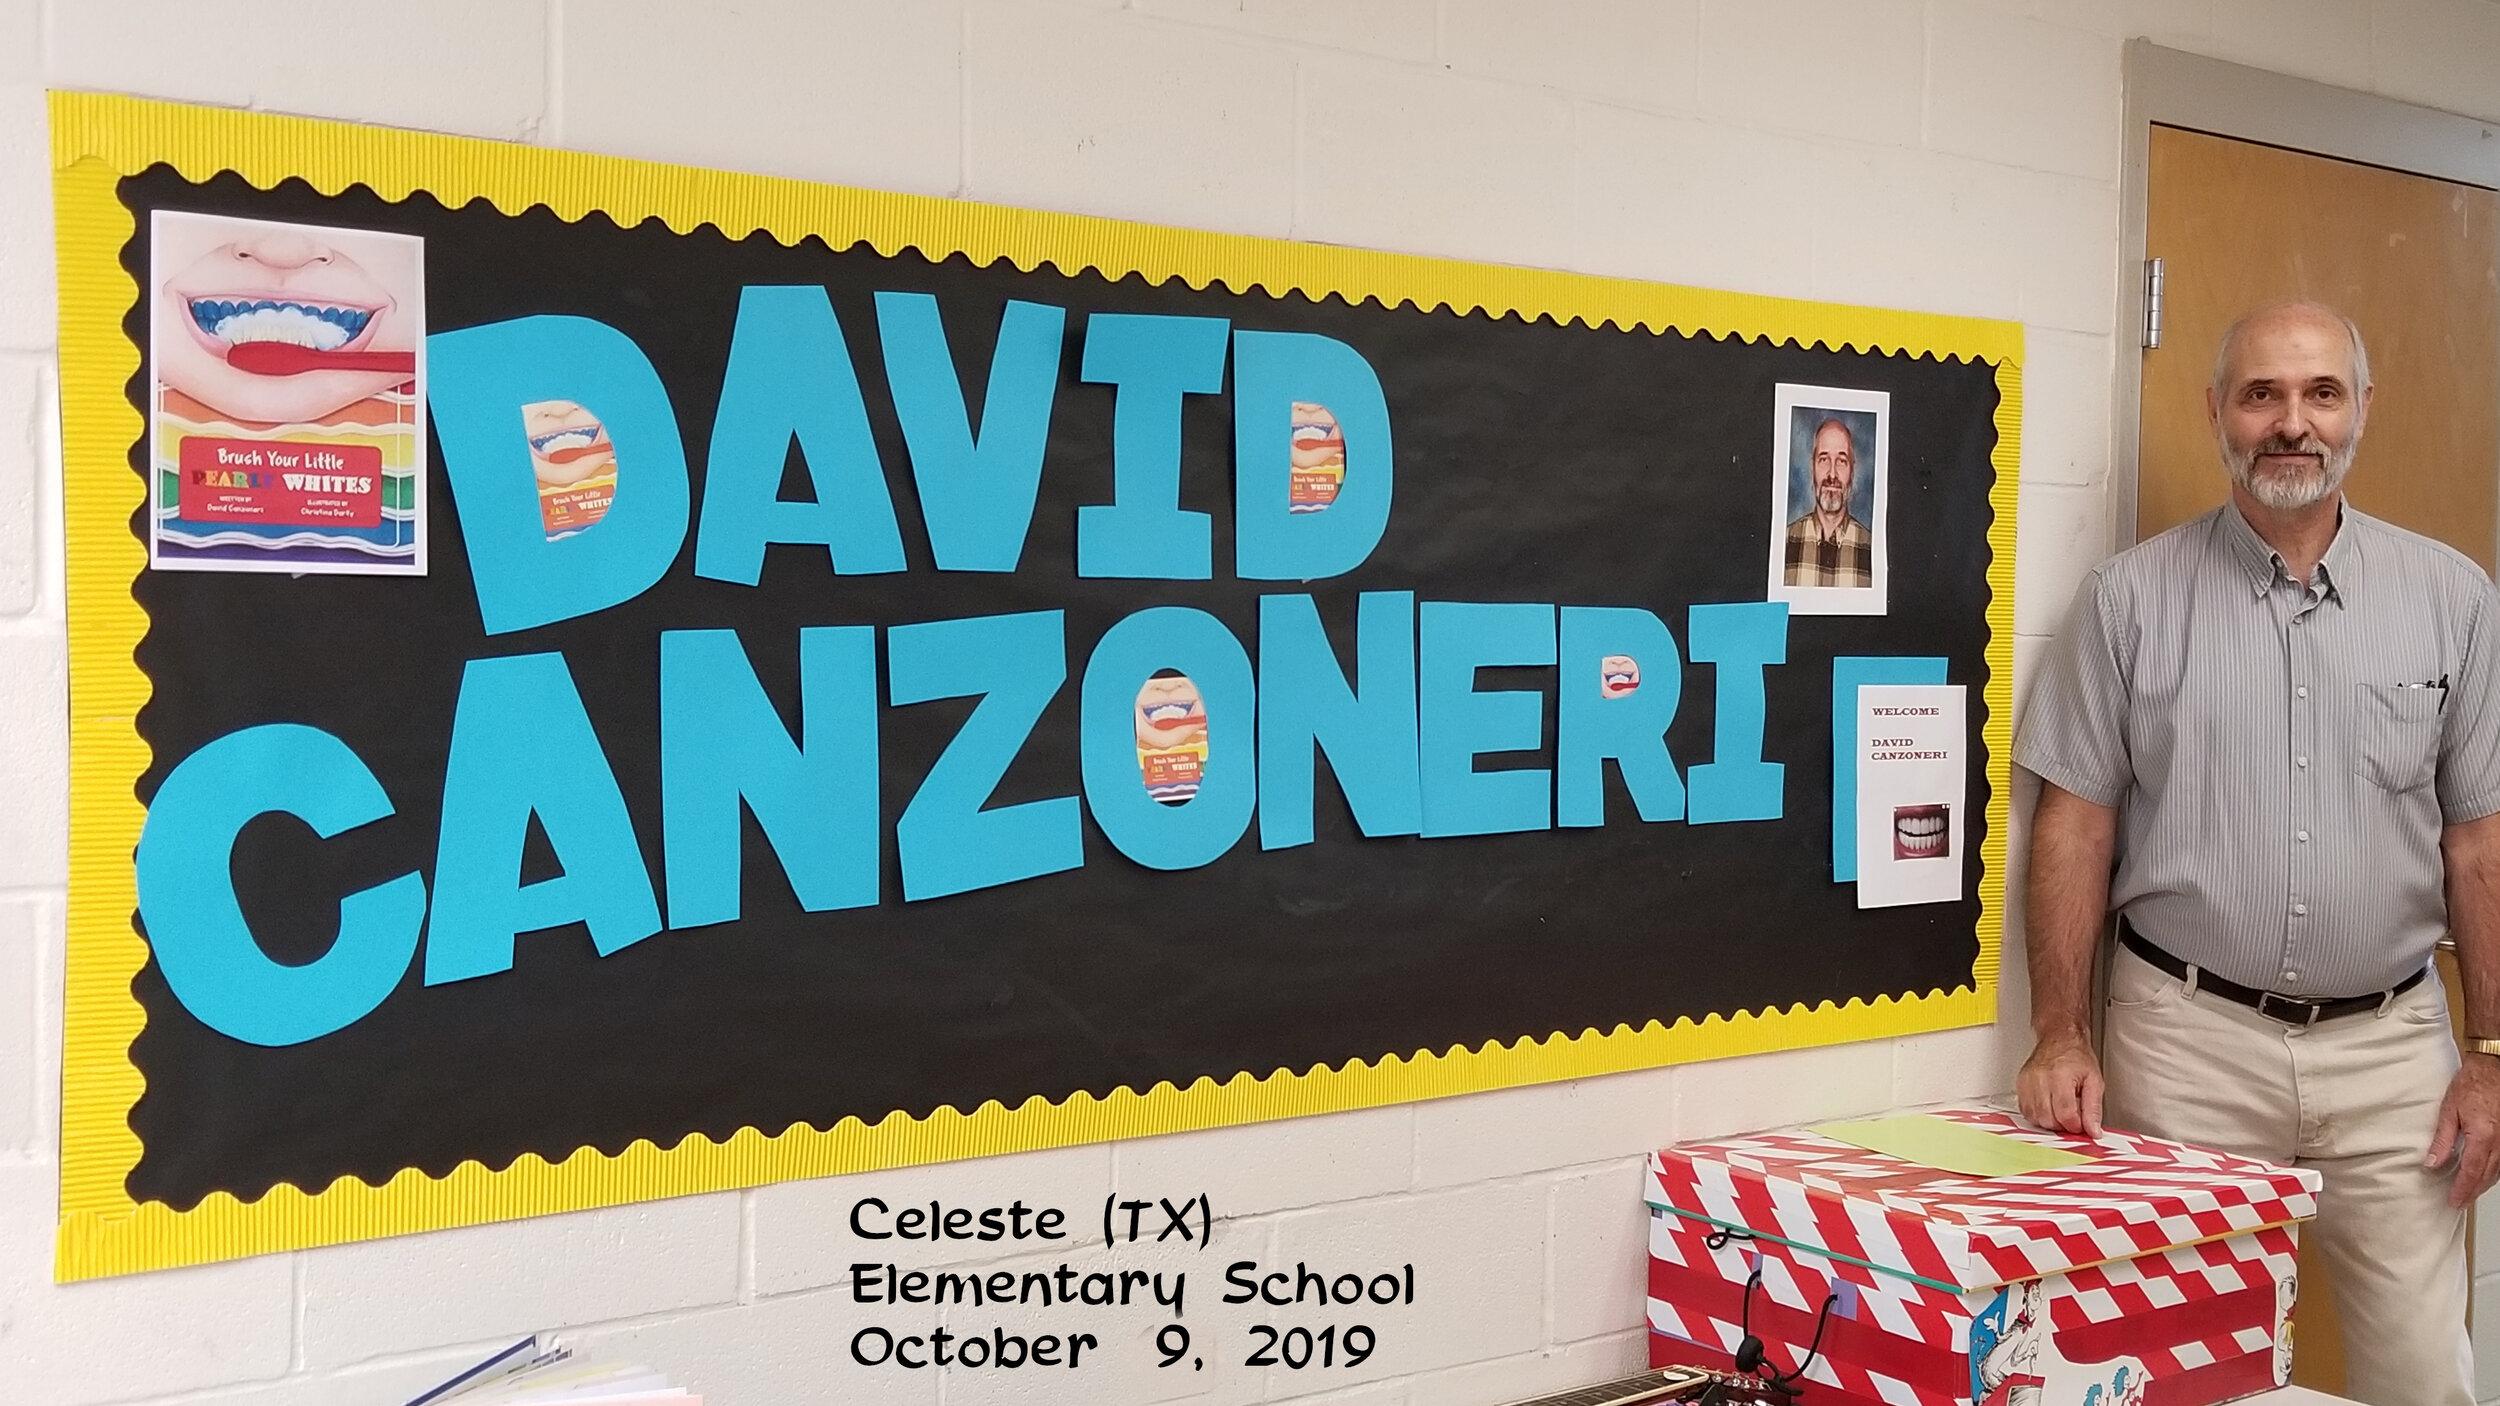 David Canzoneri bulletin board.jpg